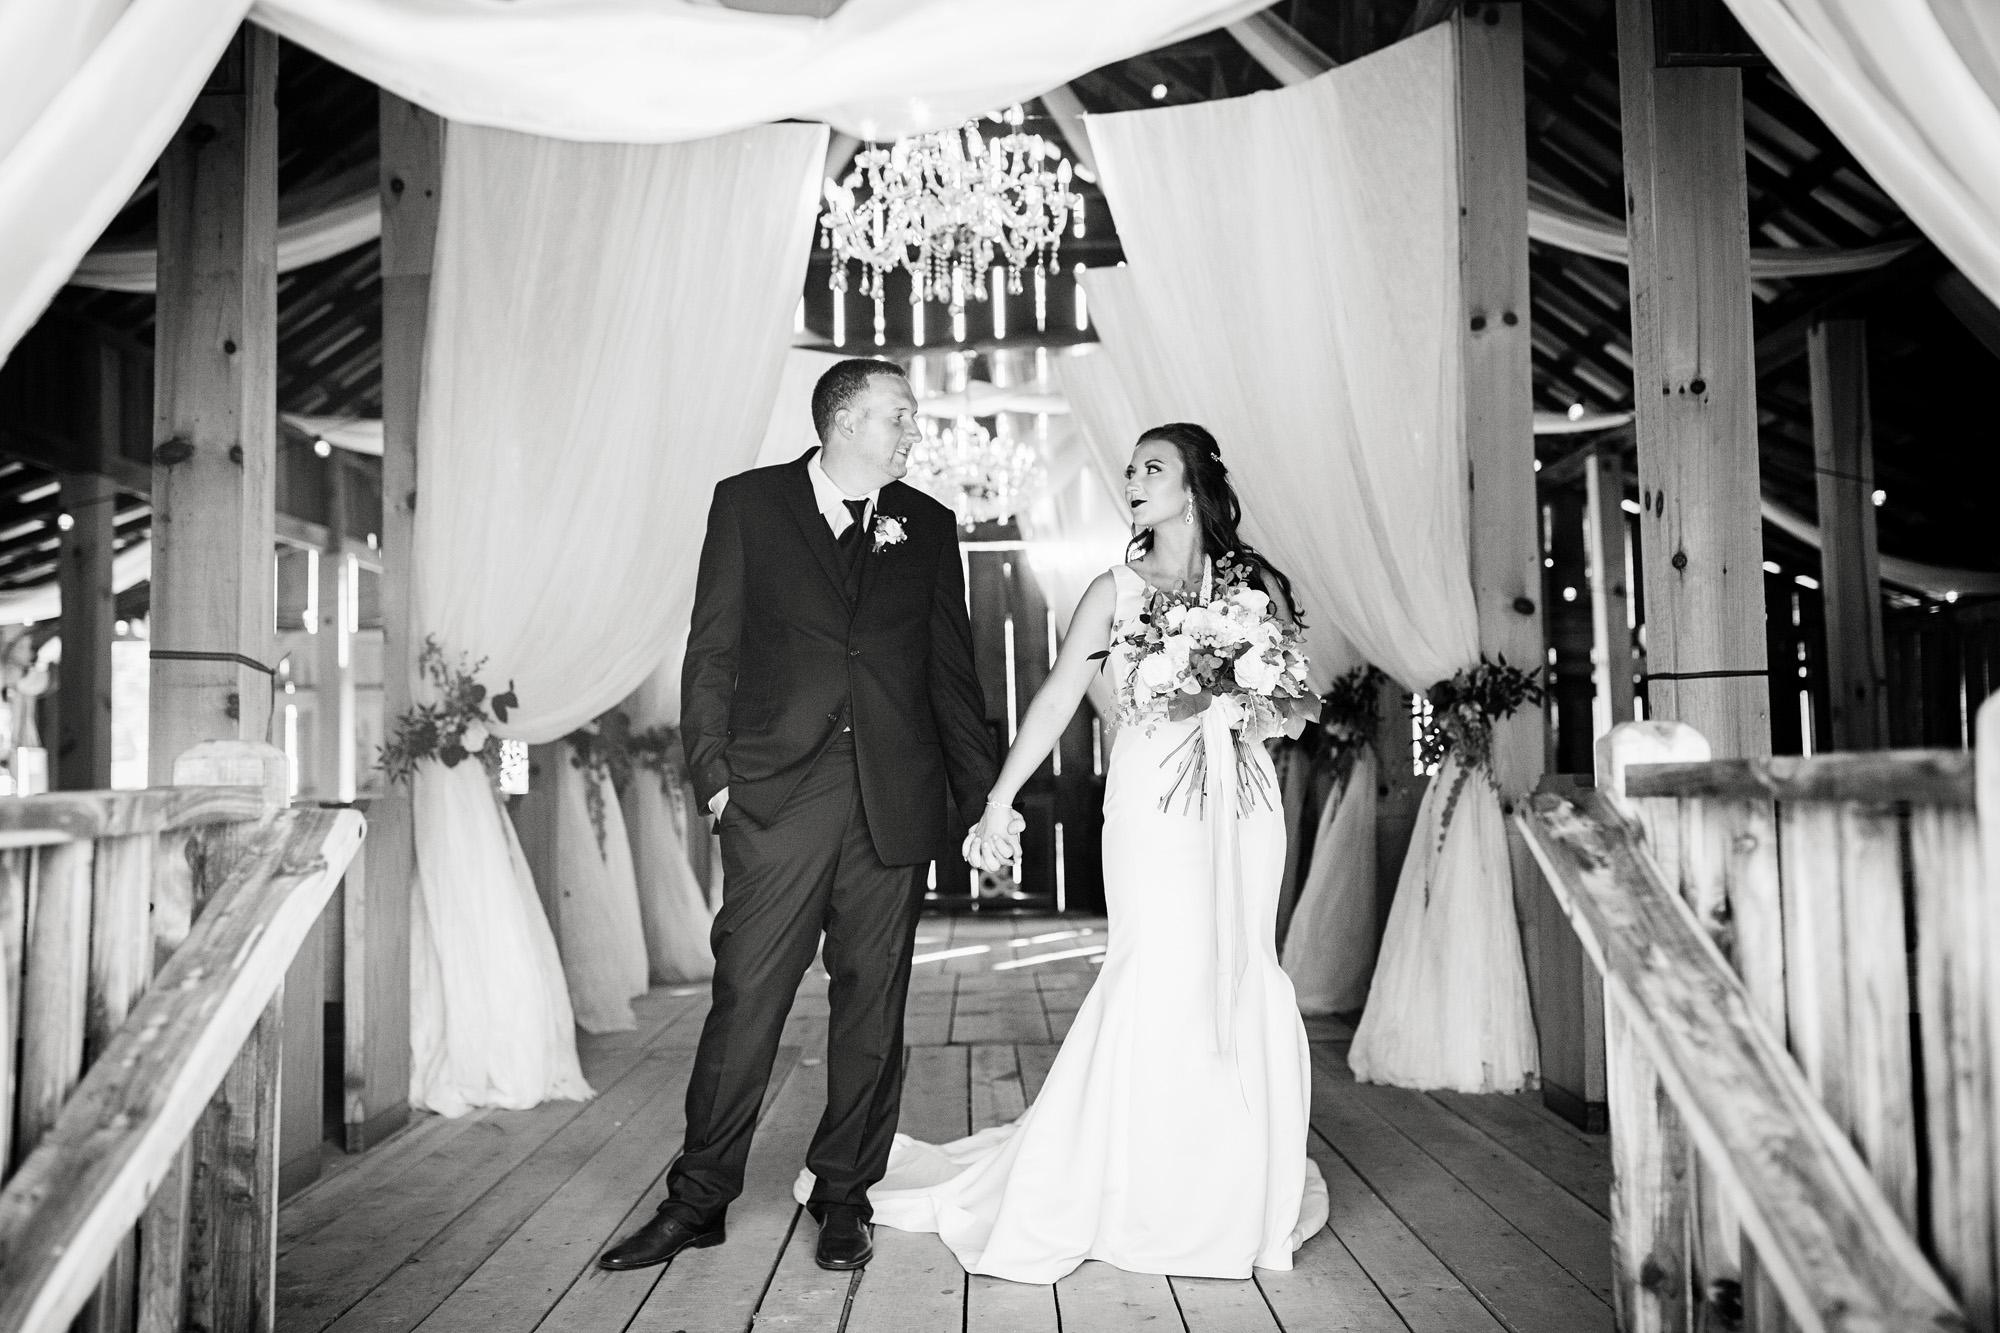 Seriously_Sabrina_Photography_Red_River_Gorge_Wedding_Barn_Robinson79.jpg